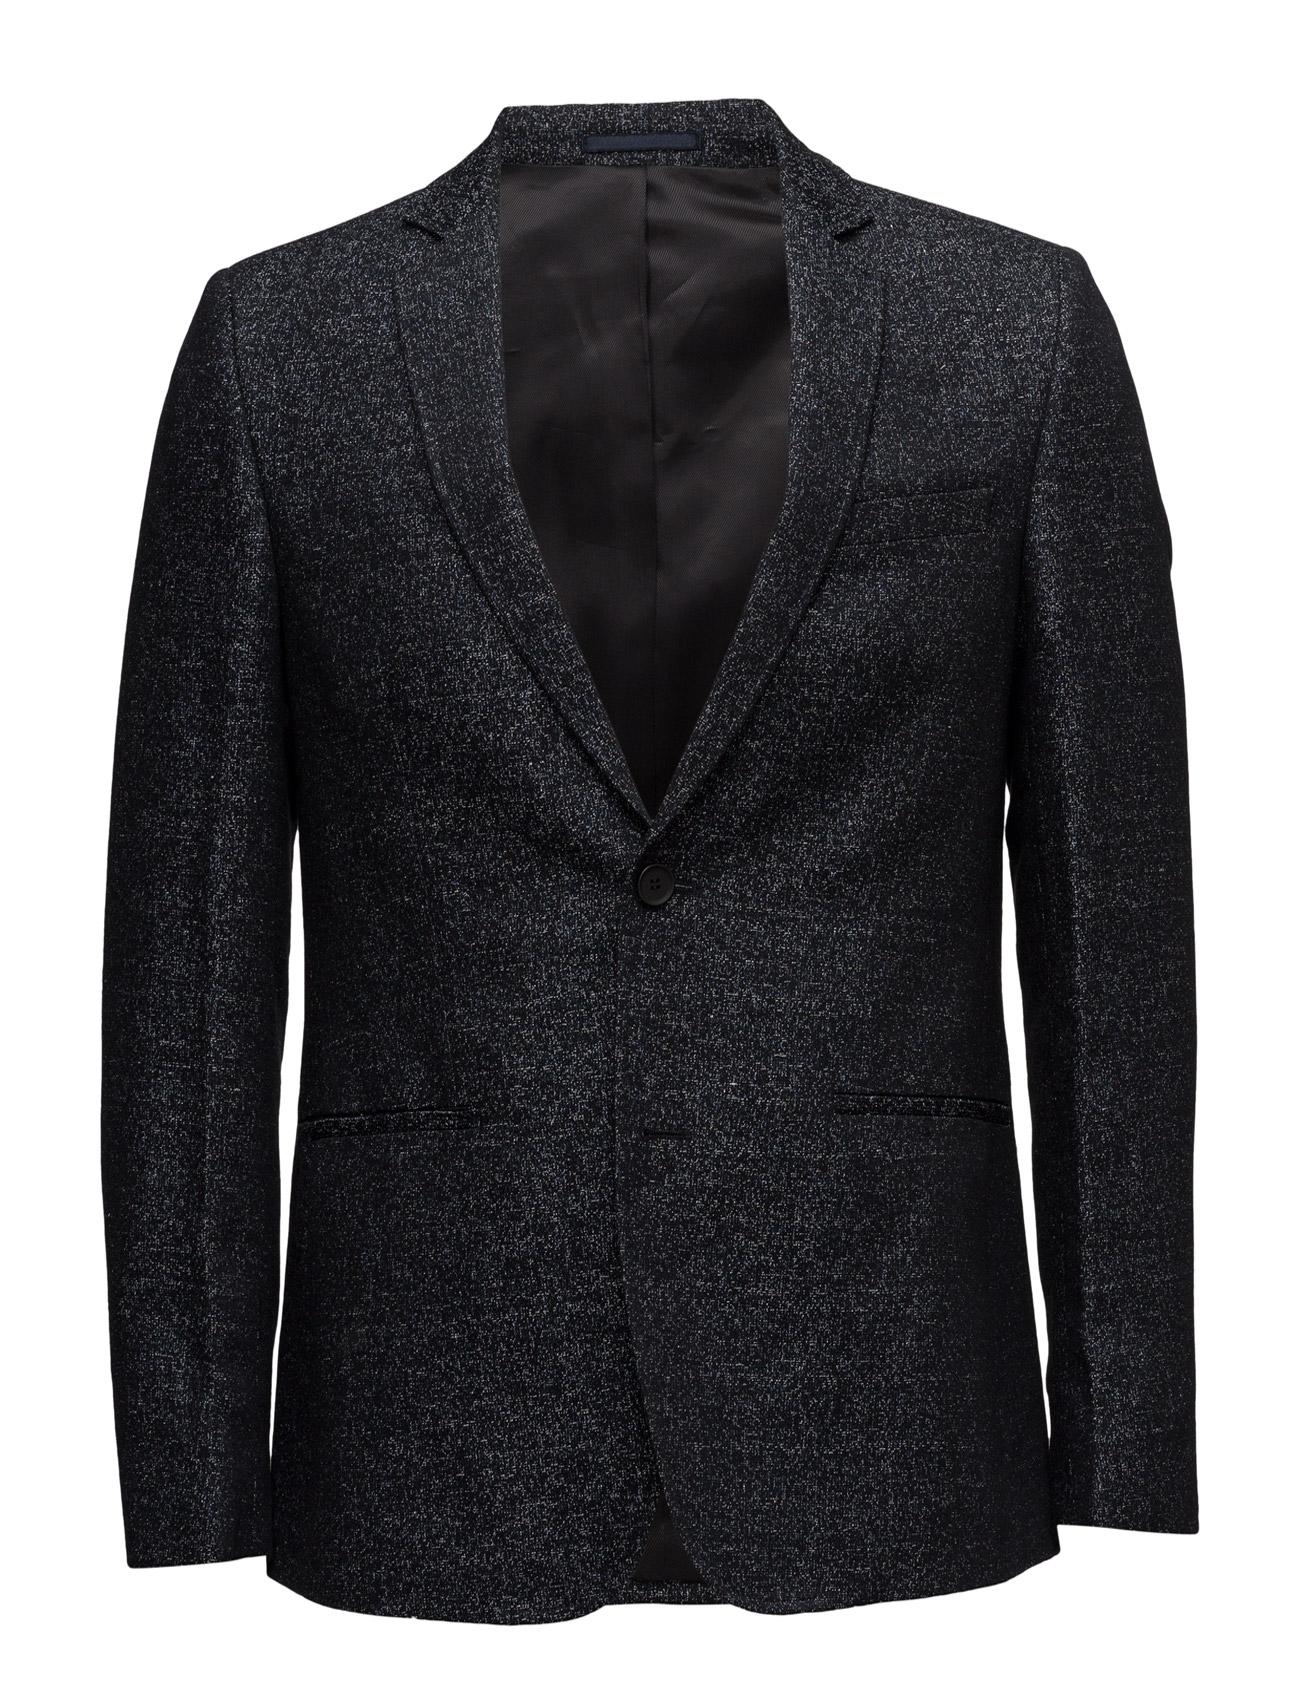 Adams Full Bruuns Bazaar Blazere til Mænd i Sort